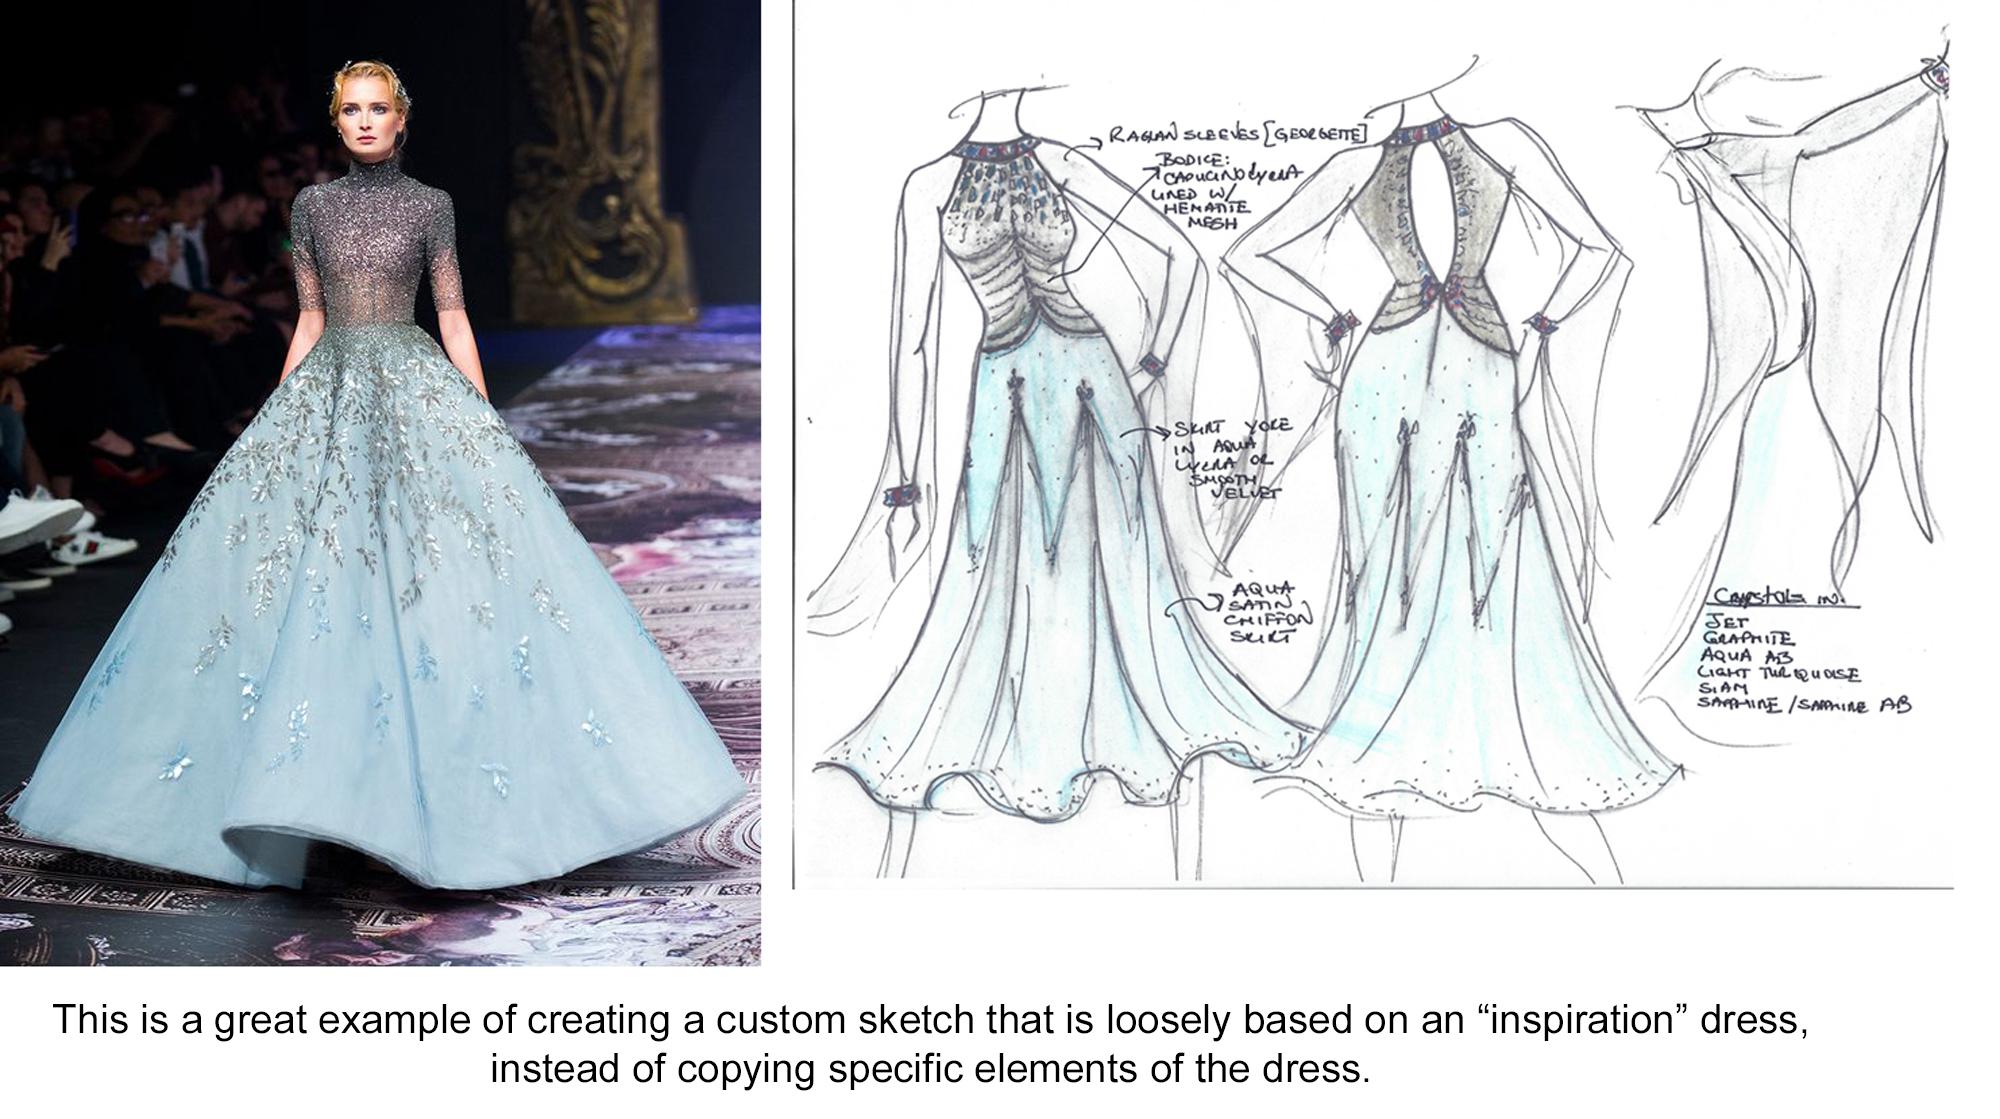 Ballgown Design Challenge dress design women compete Dancesport ballroom Country dance evening gown Standard ballgown sketch